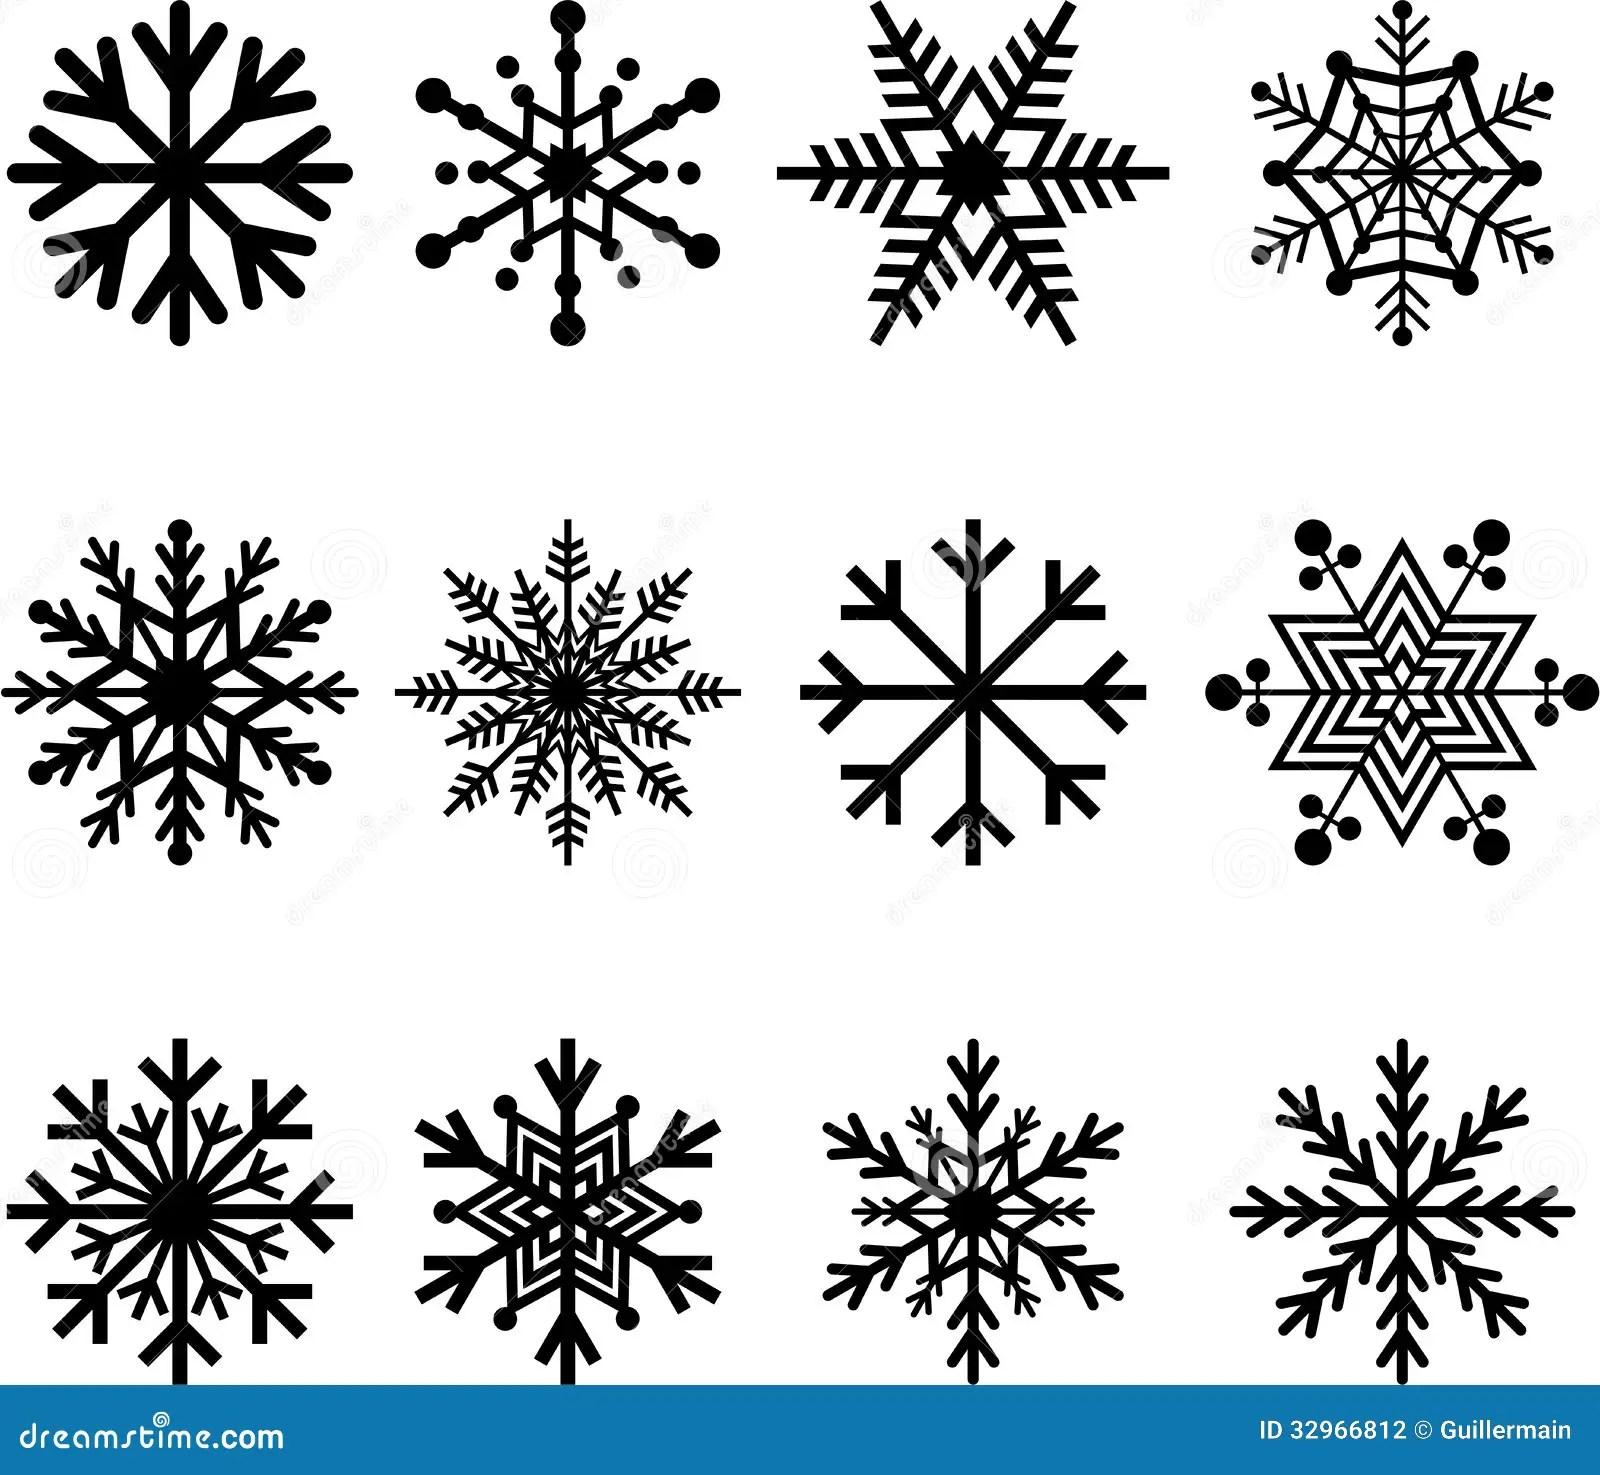 Icy Snowflake Pattern